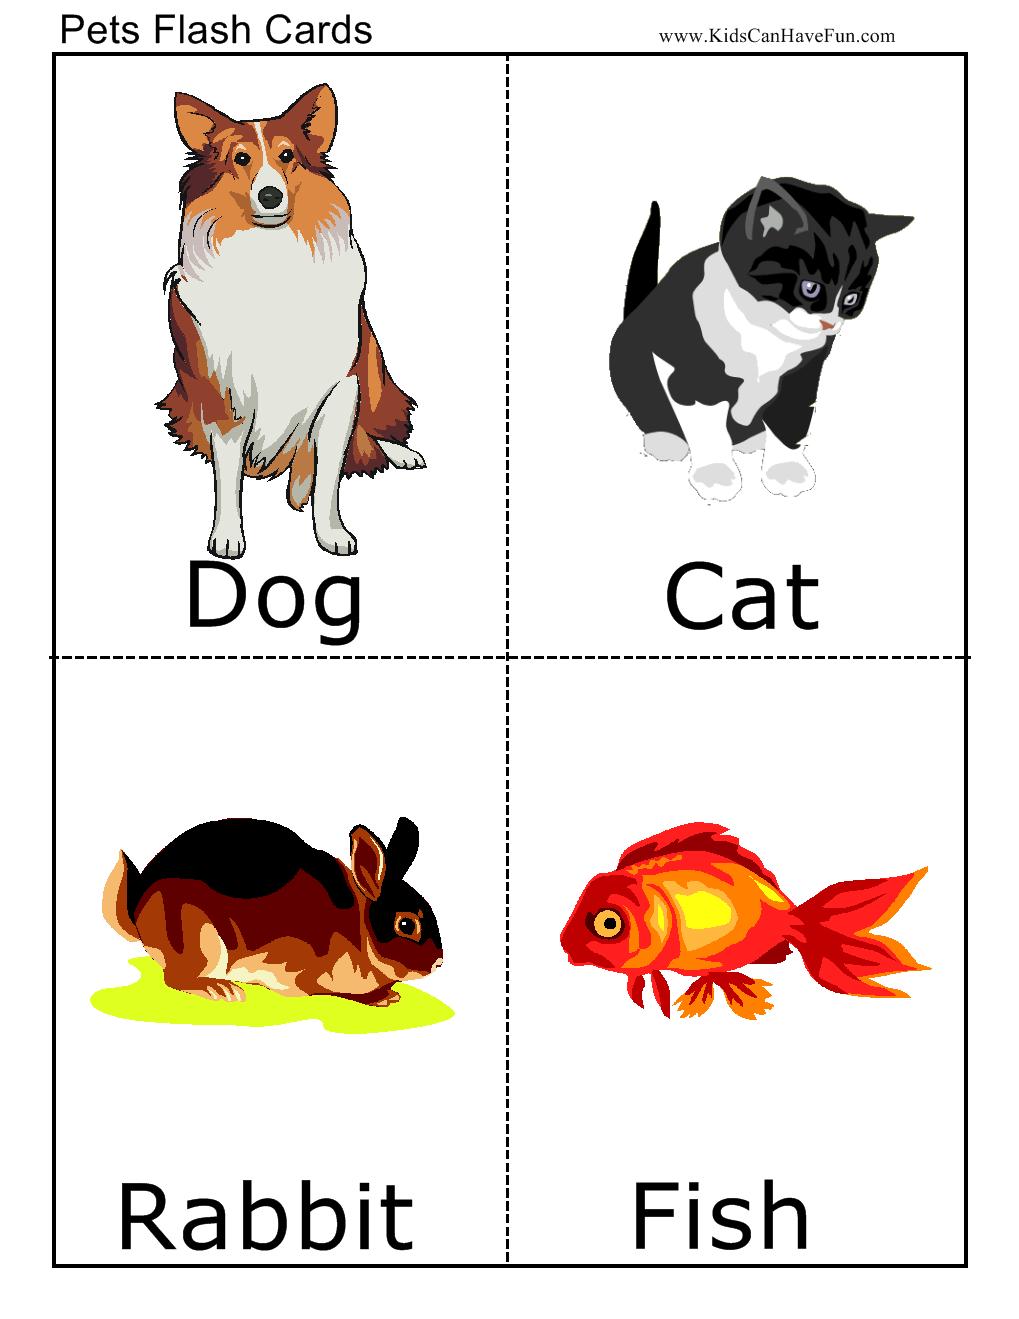 Pets Flashcards Flashcards For Kids Animal Flashcards Flashcards